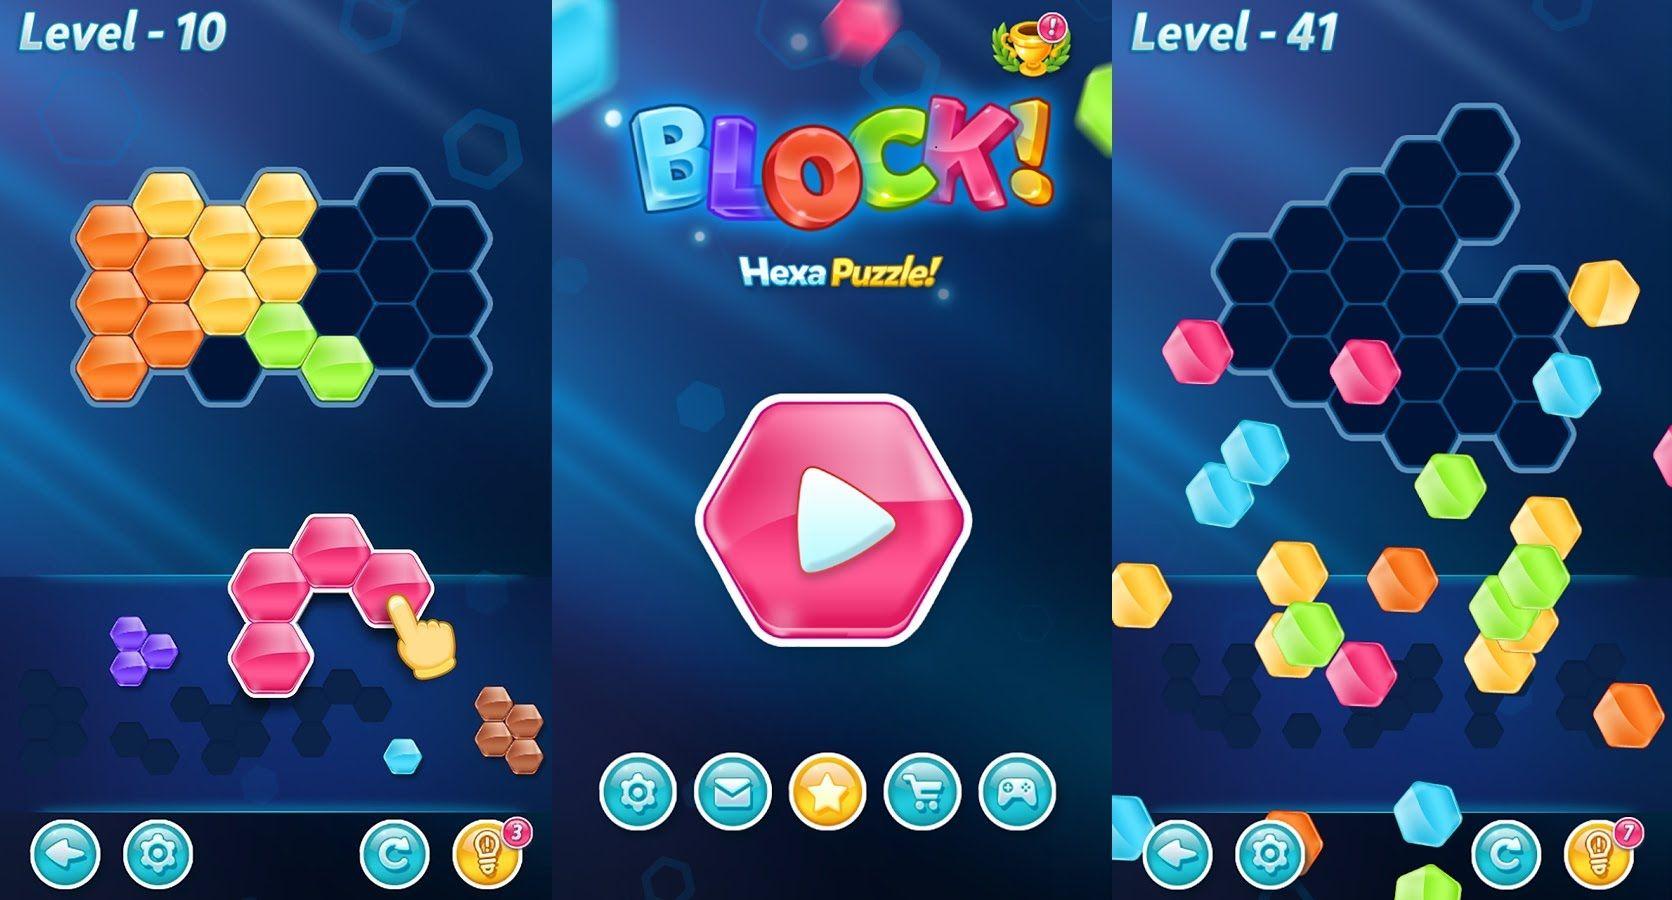 LETS GO TO BLOCK! HEXA PUZZLE GENERATOR SITE! [NEW] BLOCK